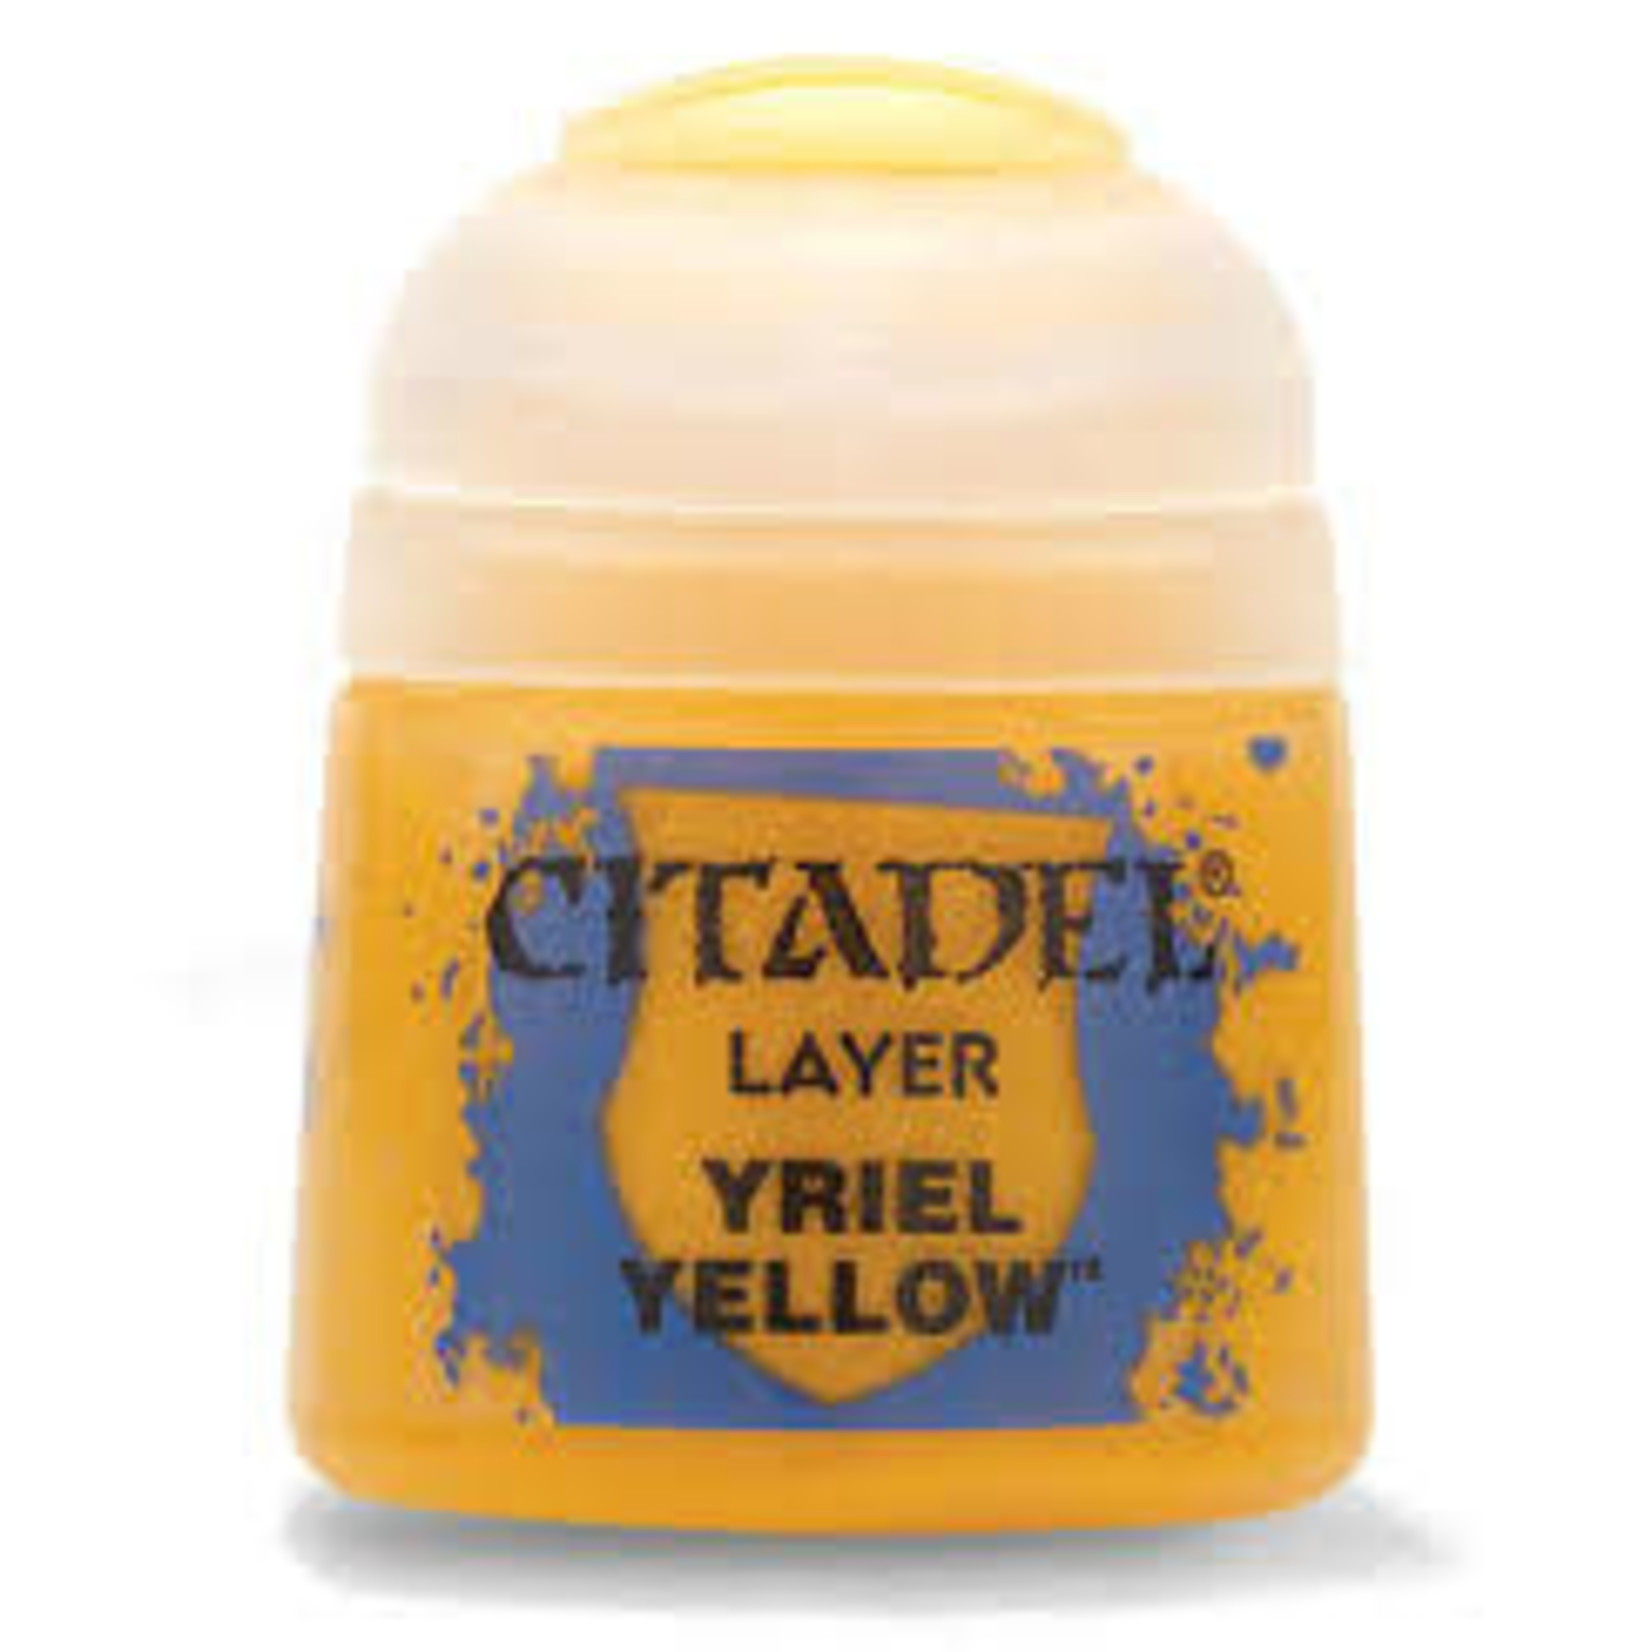 Games Workshop Citadel Paint: Yriel Yellow 12ml